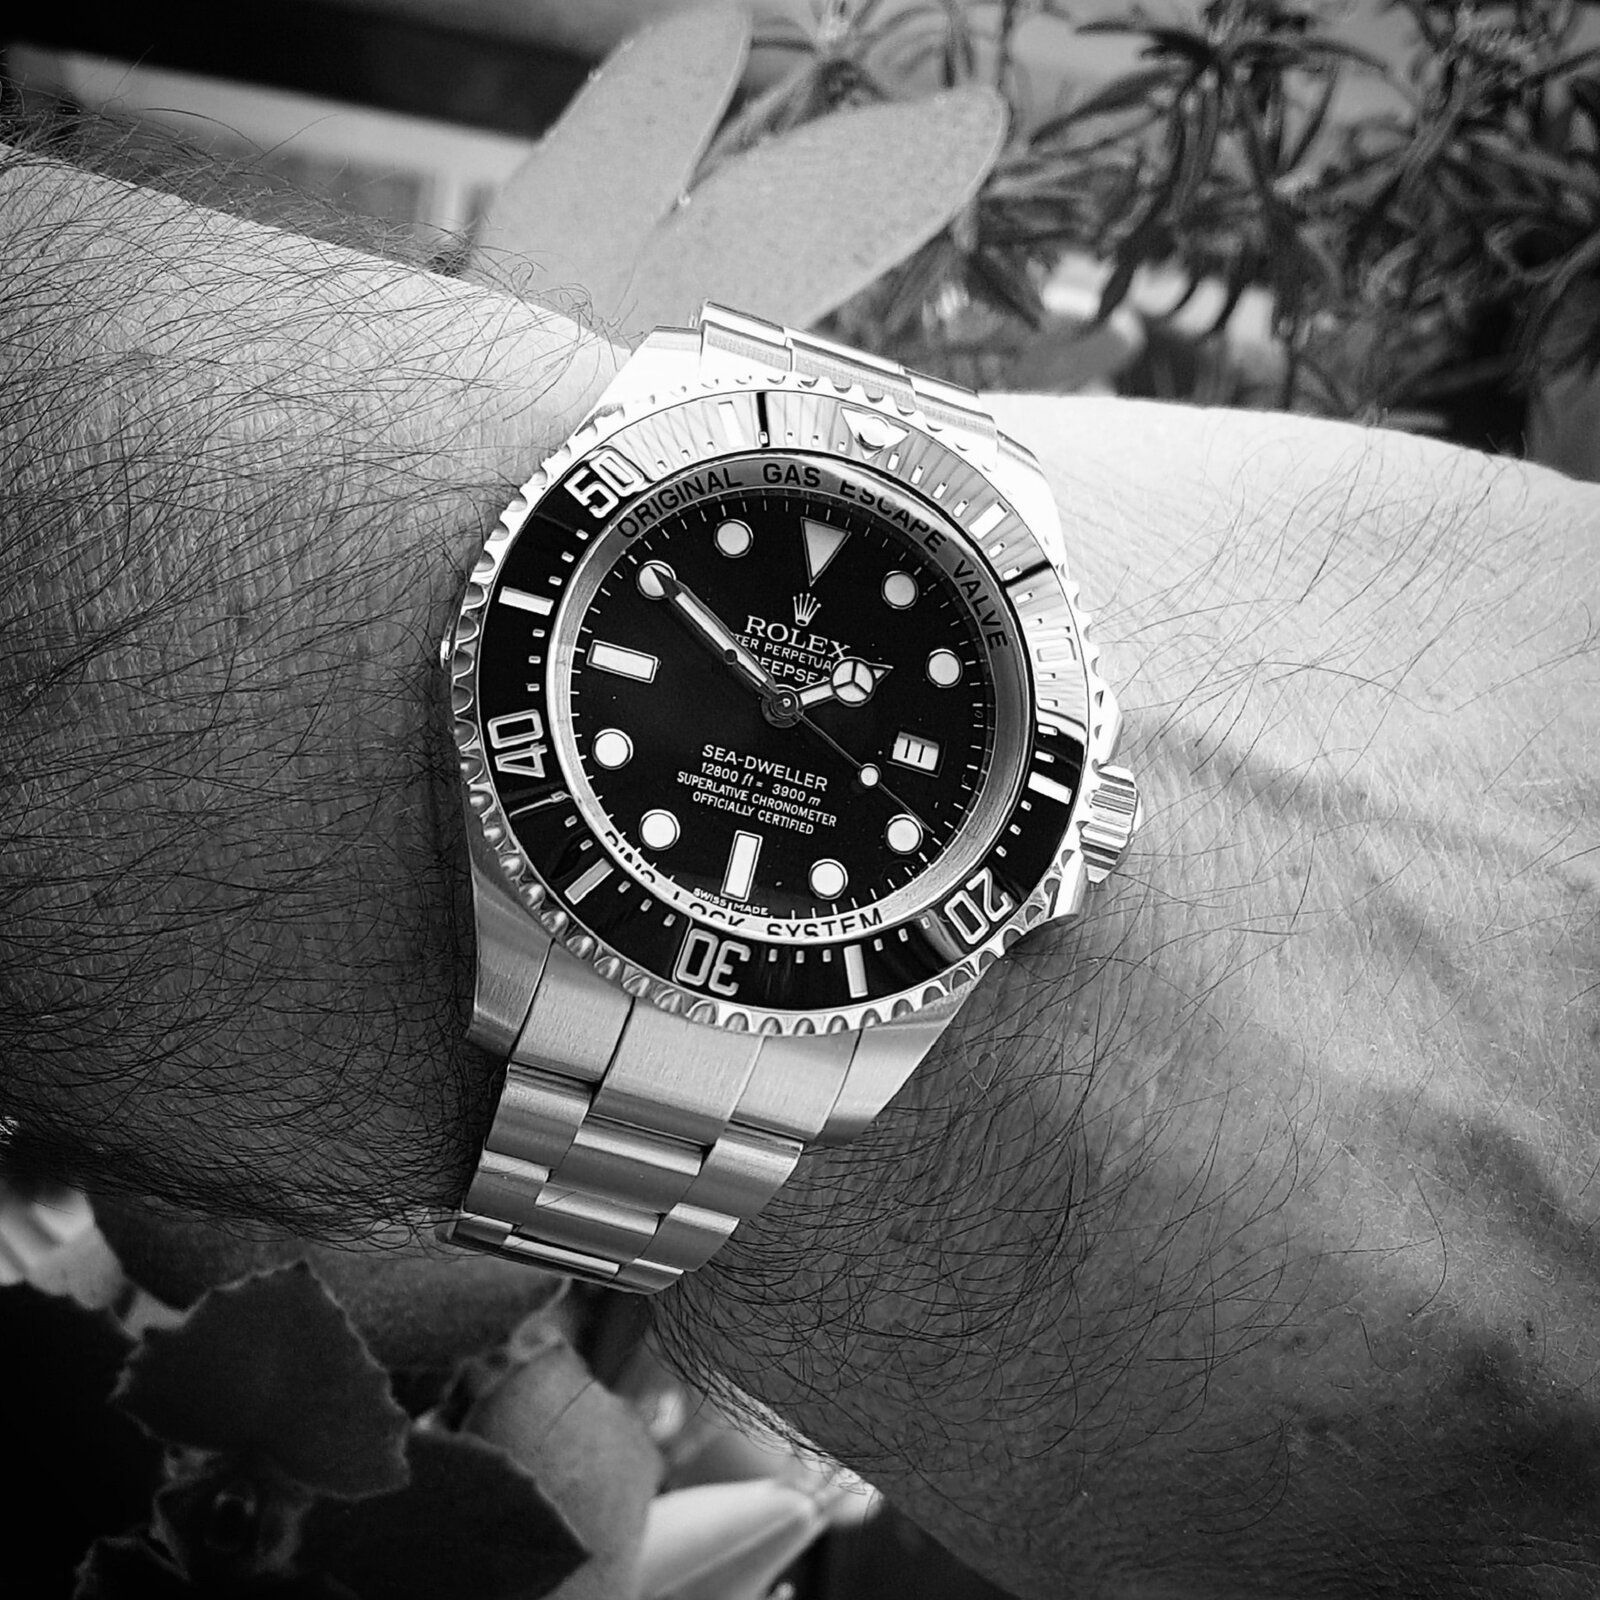 Rolex Sea-Dweller Deepsea 44mm 3900M Cal. 3135 Ref. 116660 (B&W)(1).jpg